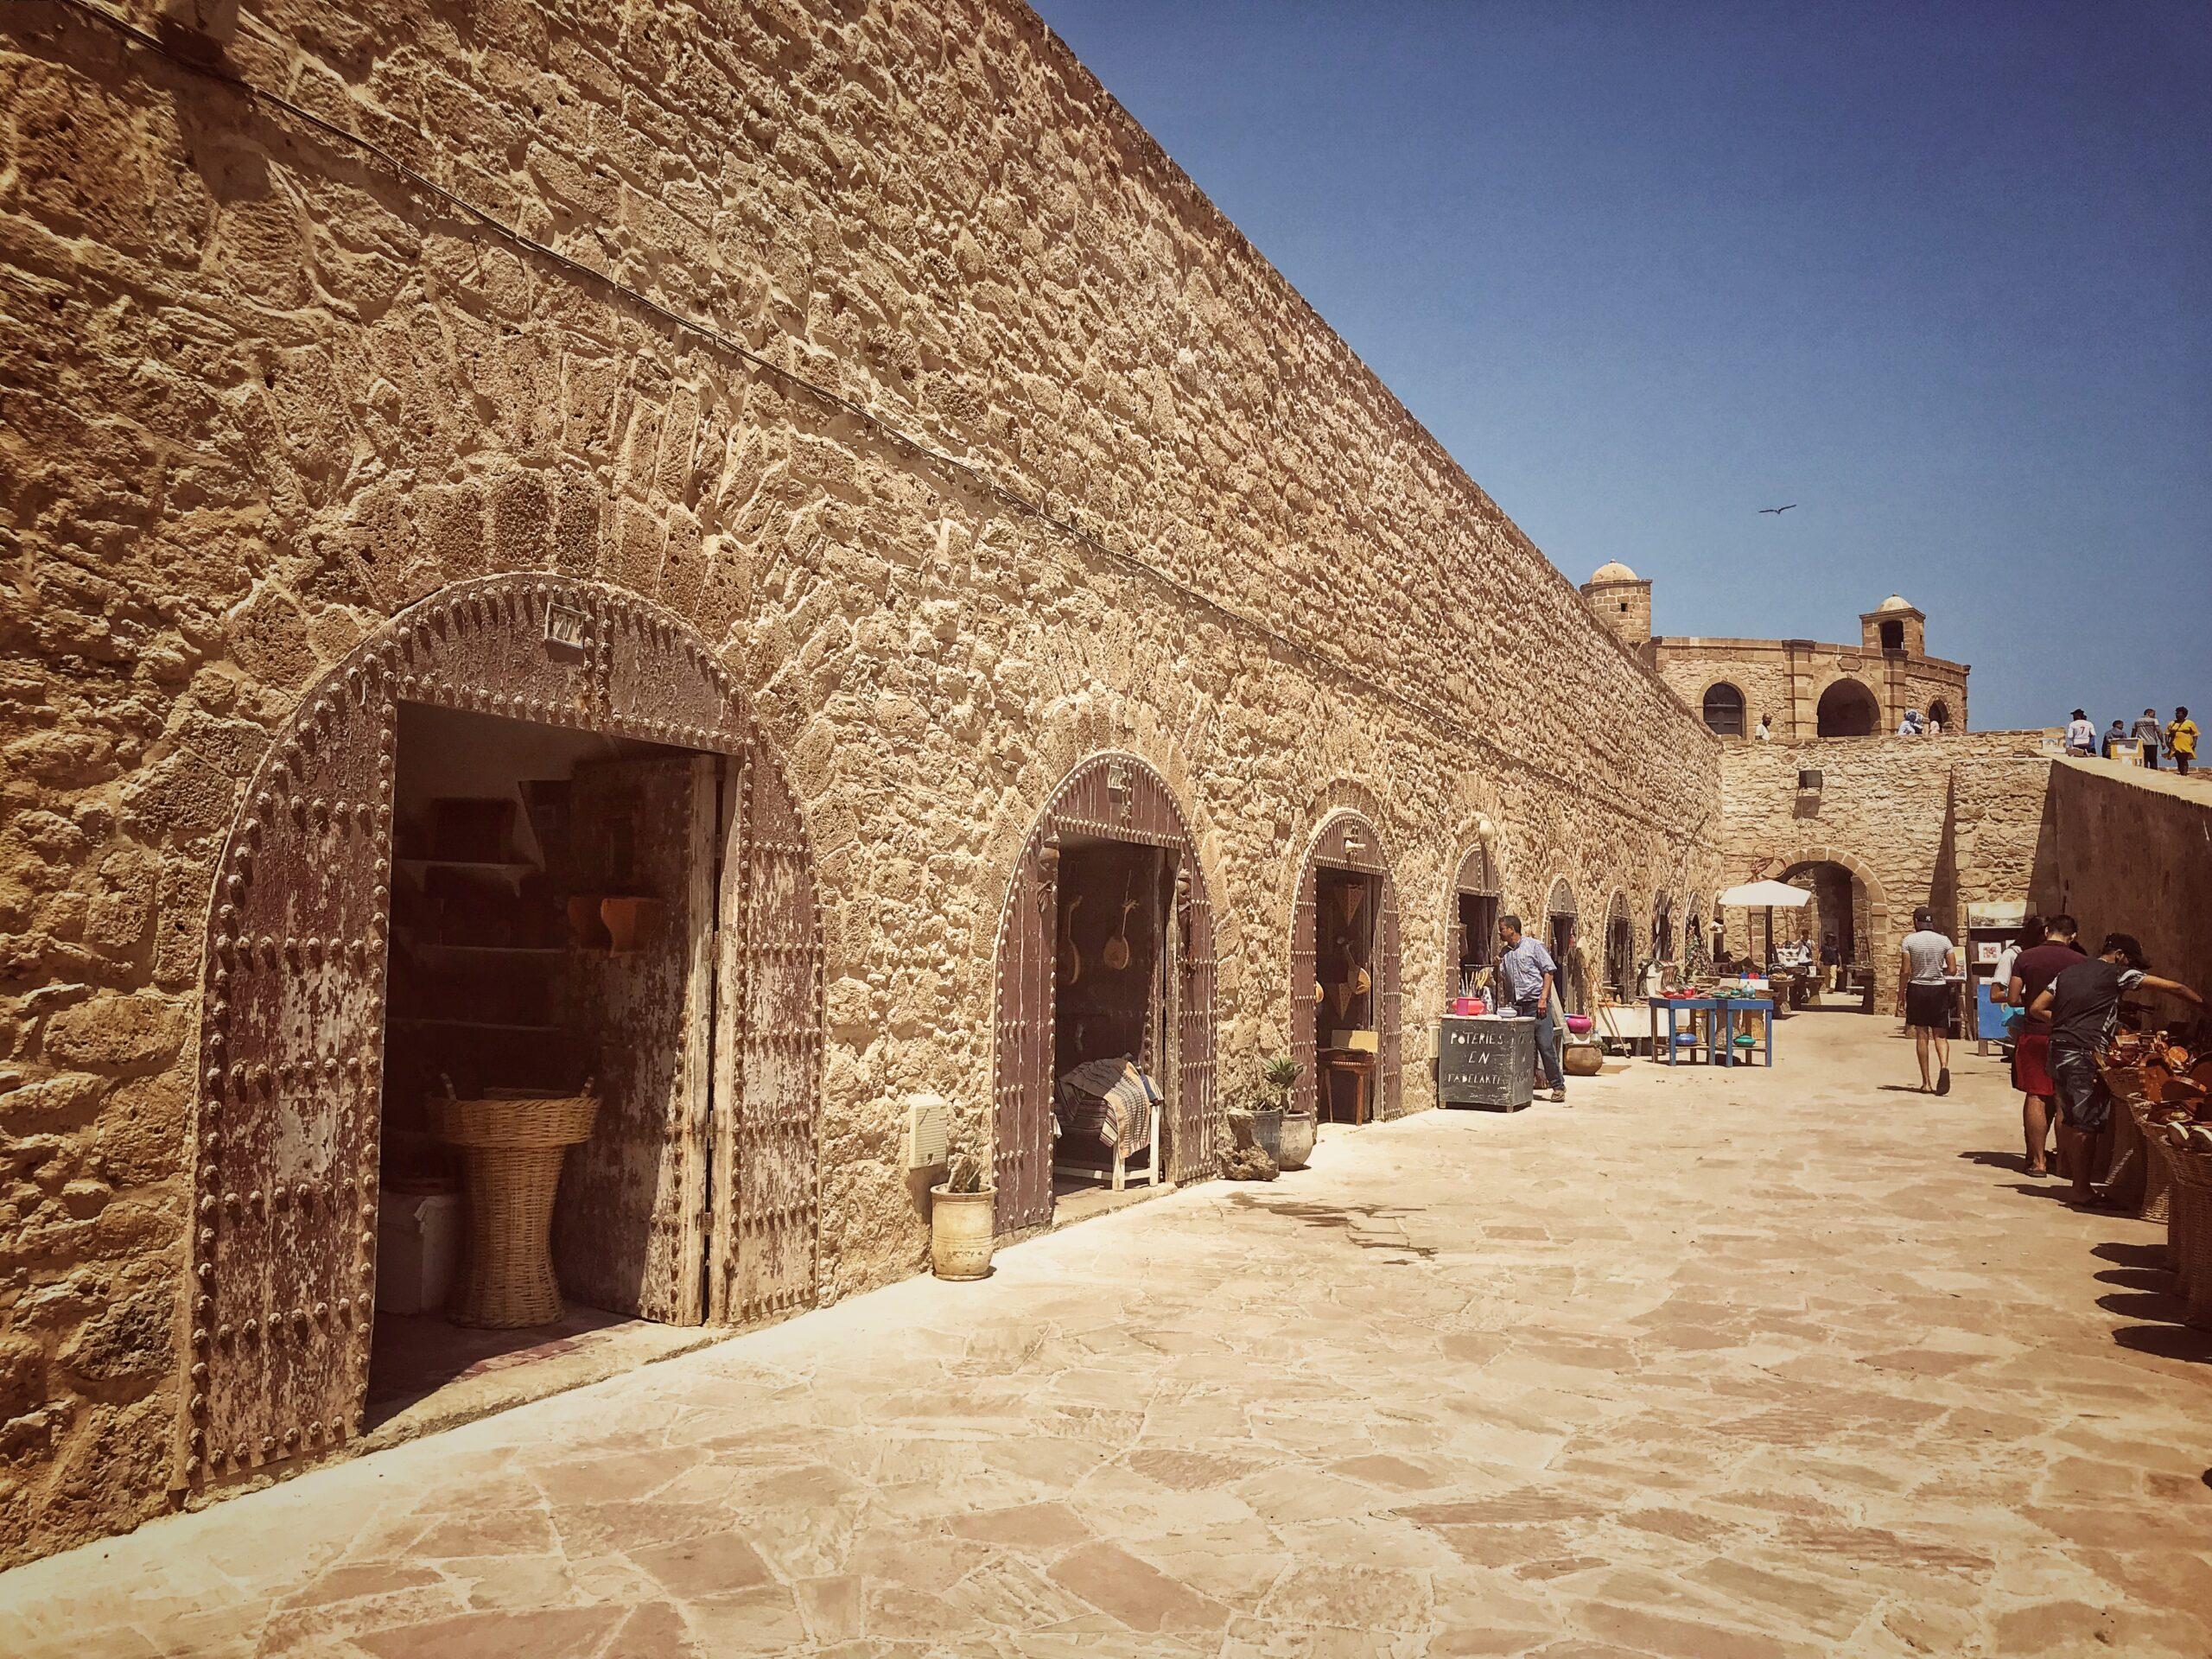 Marocco on the road: Essaouria